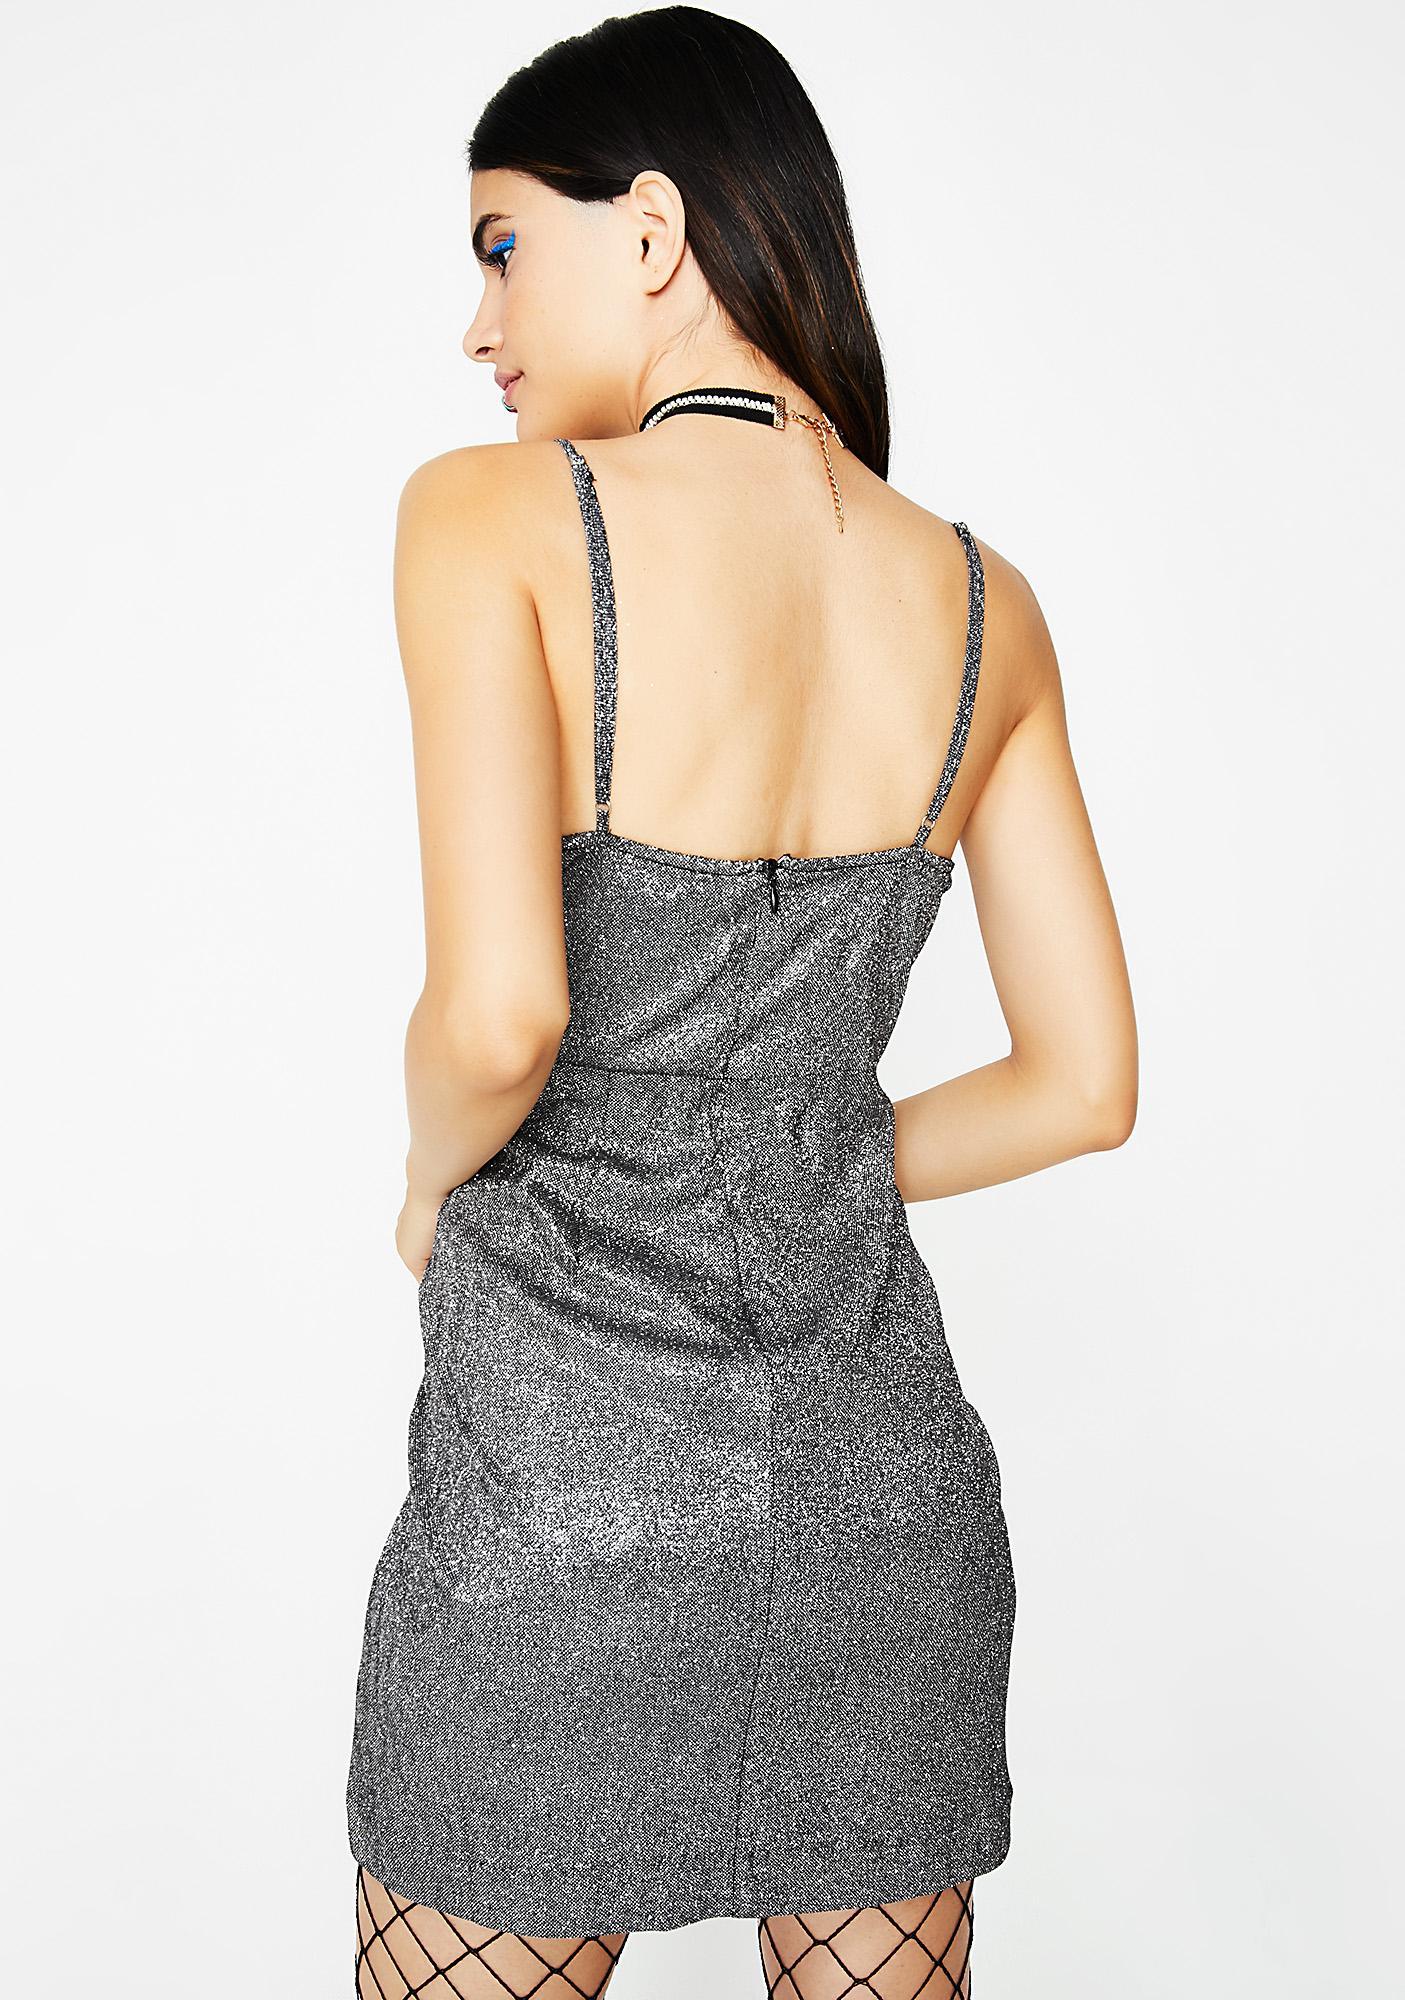 Dime Piece Sparkly Dress